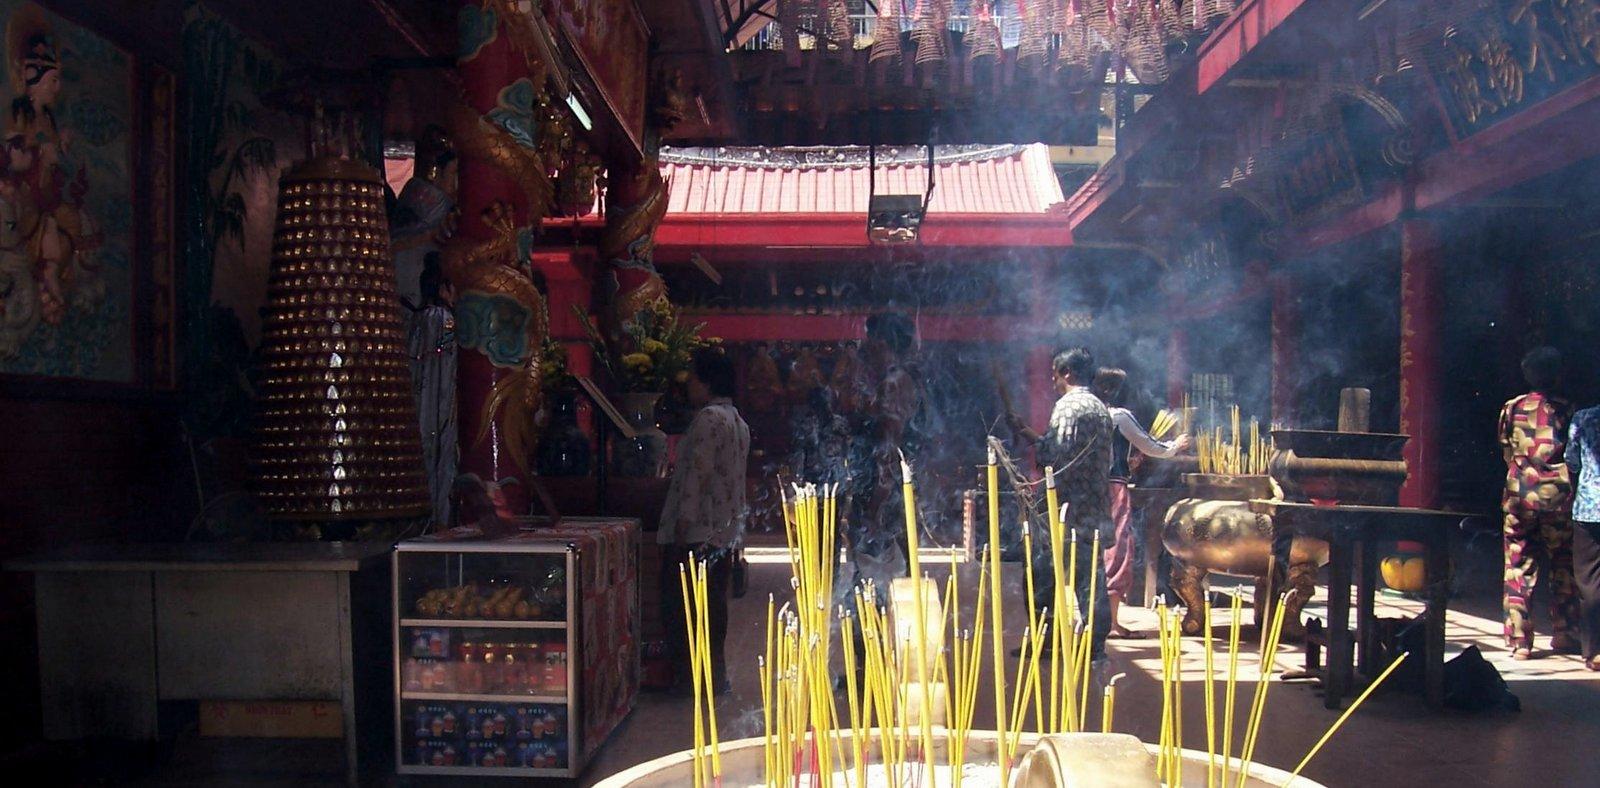 Phuoc-An-Hoi-Quan-Tempel in Cholon - Vietnam